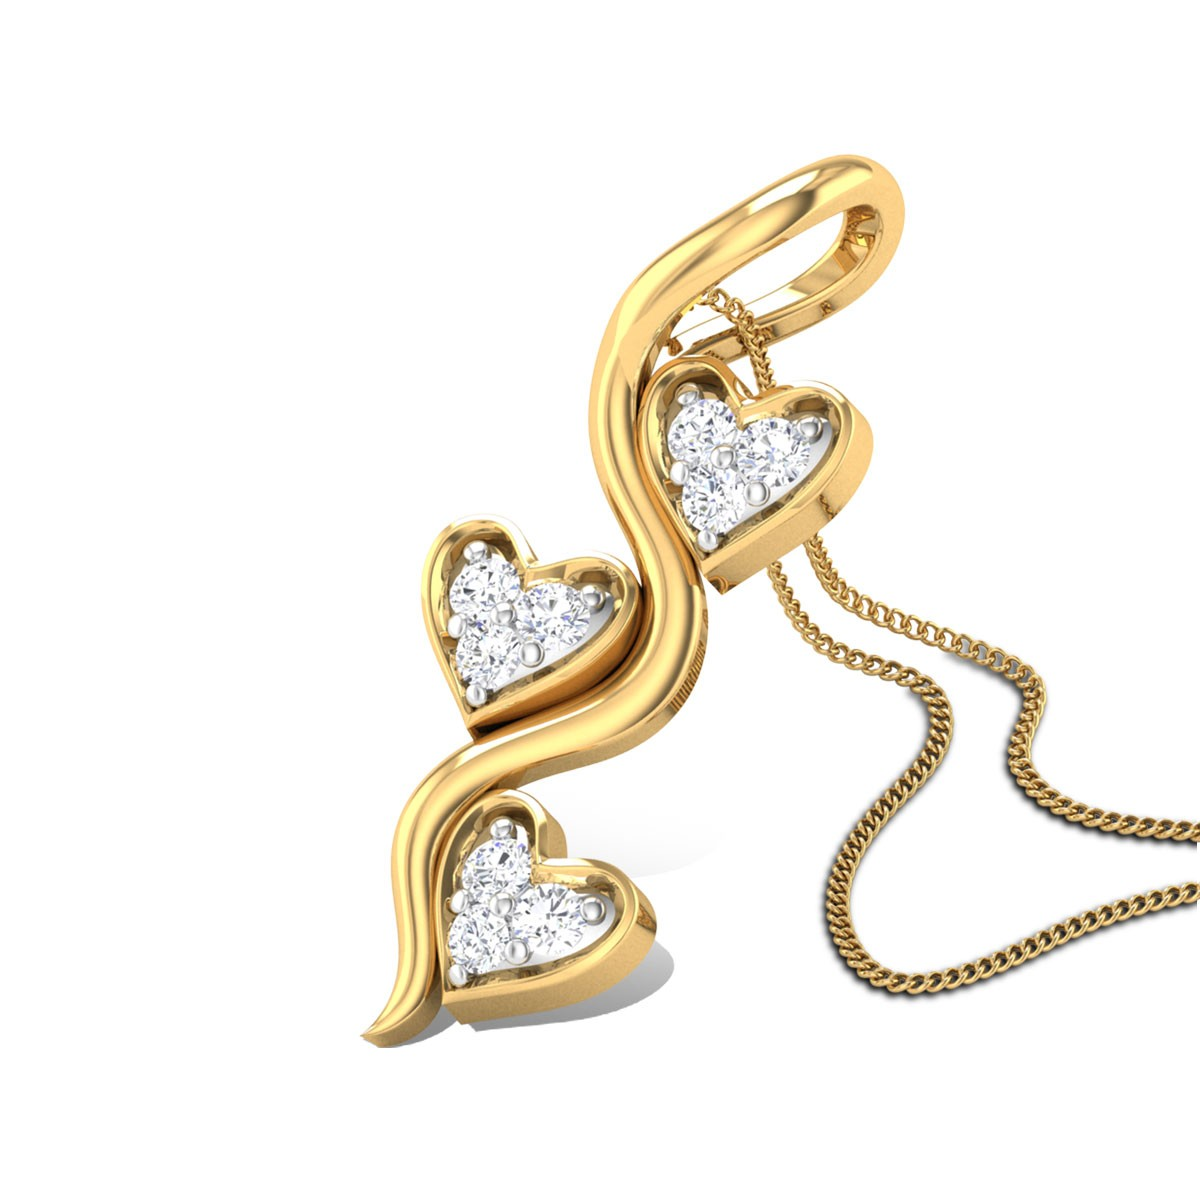 Passion dew Diamond Pendant